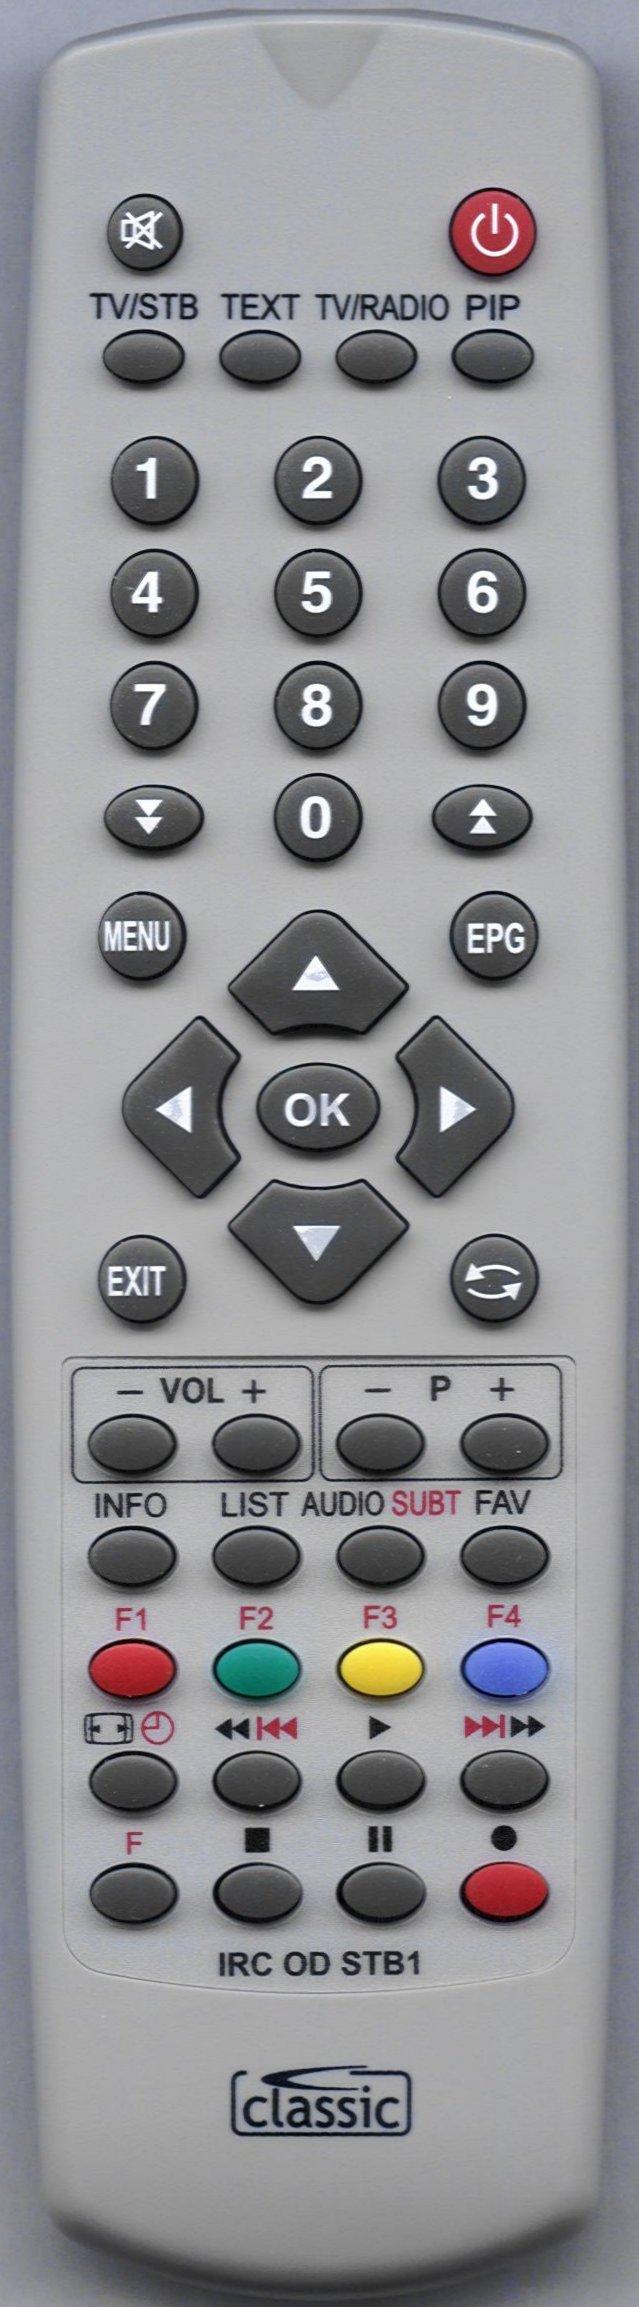 TOPFIELD TF 4000/5000PVR VERS.2 Remote Control